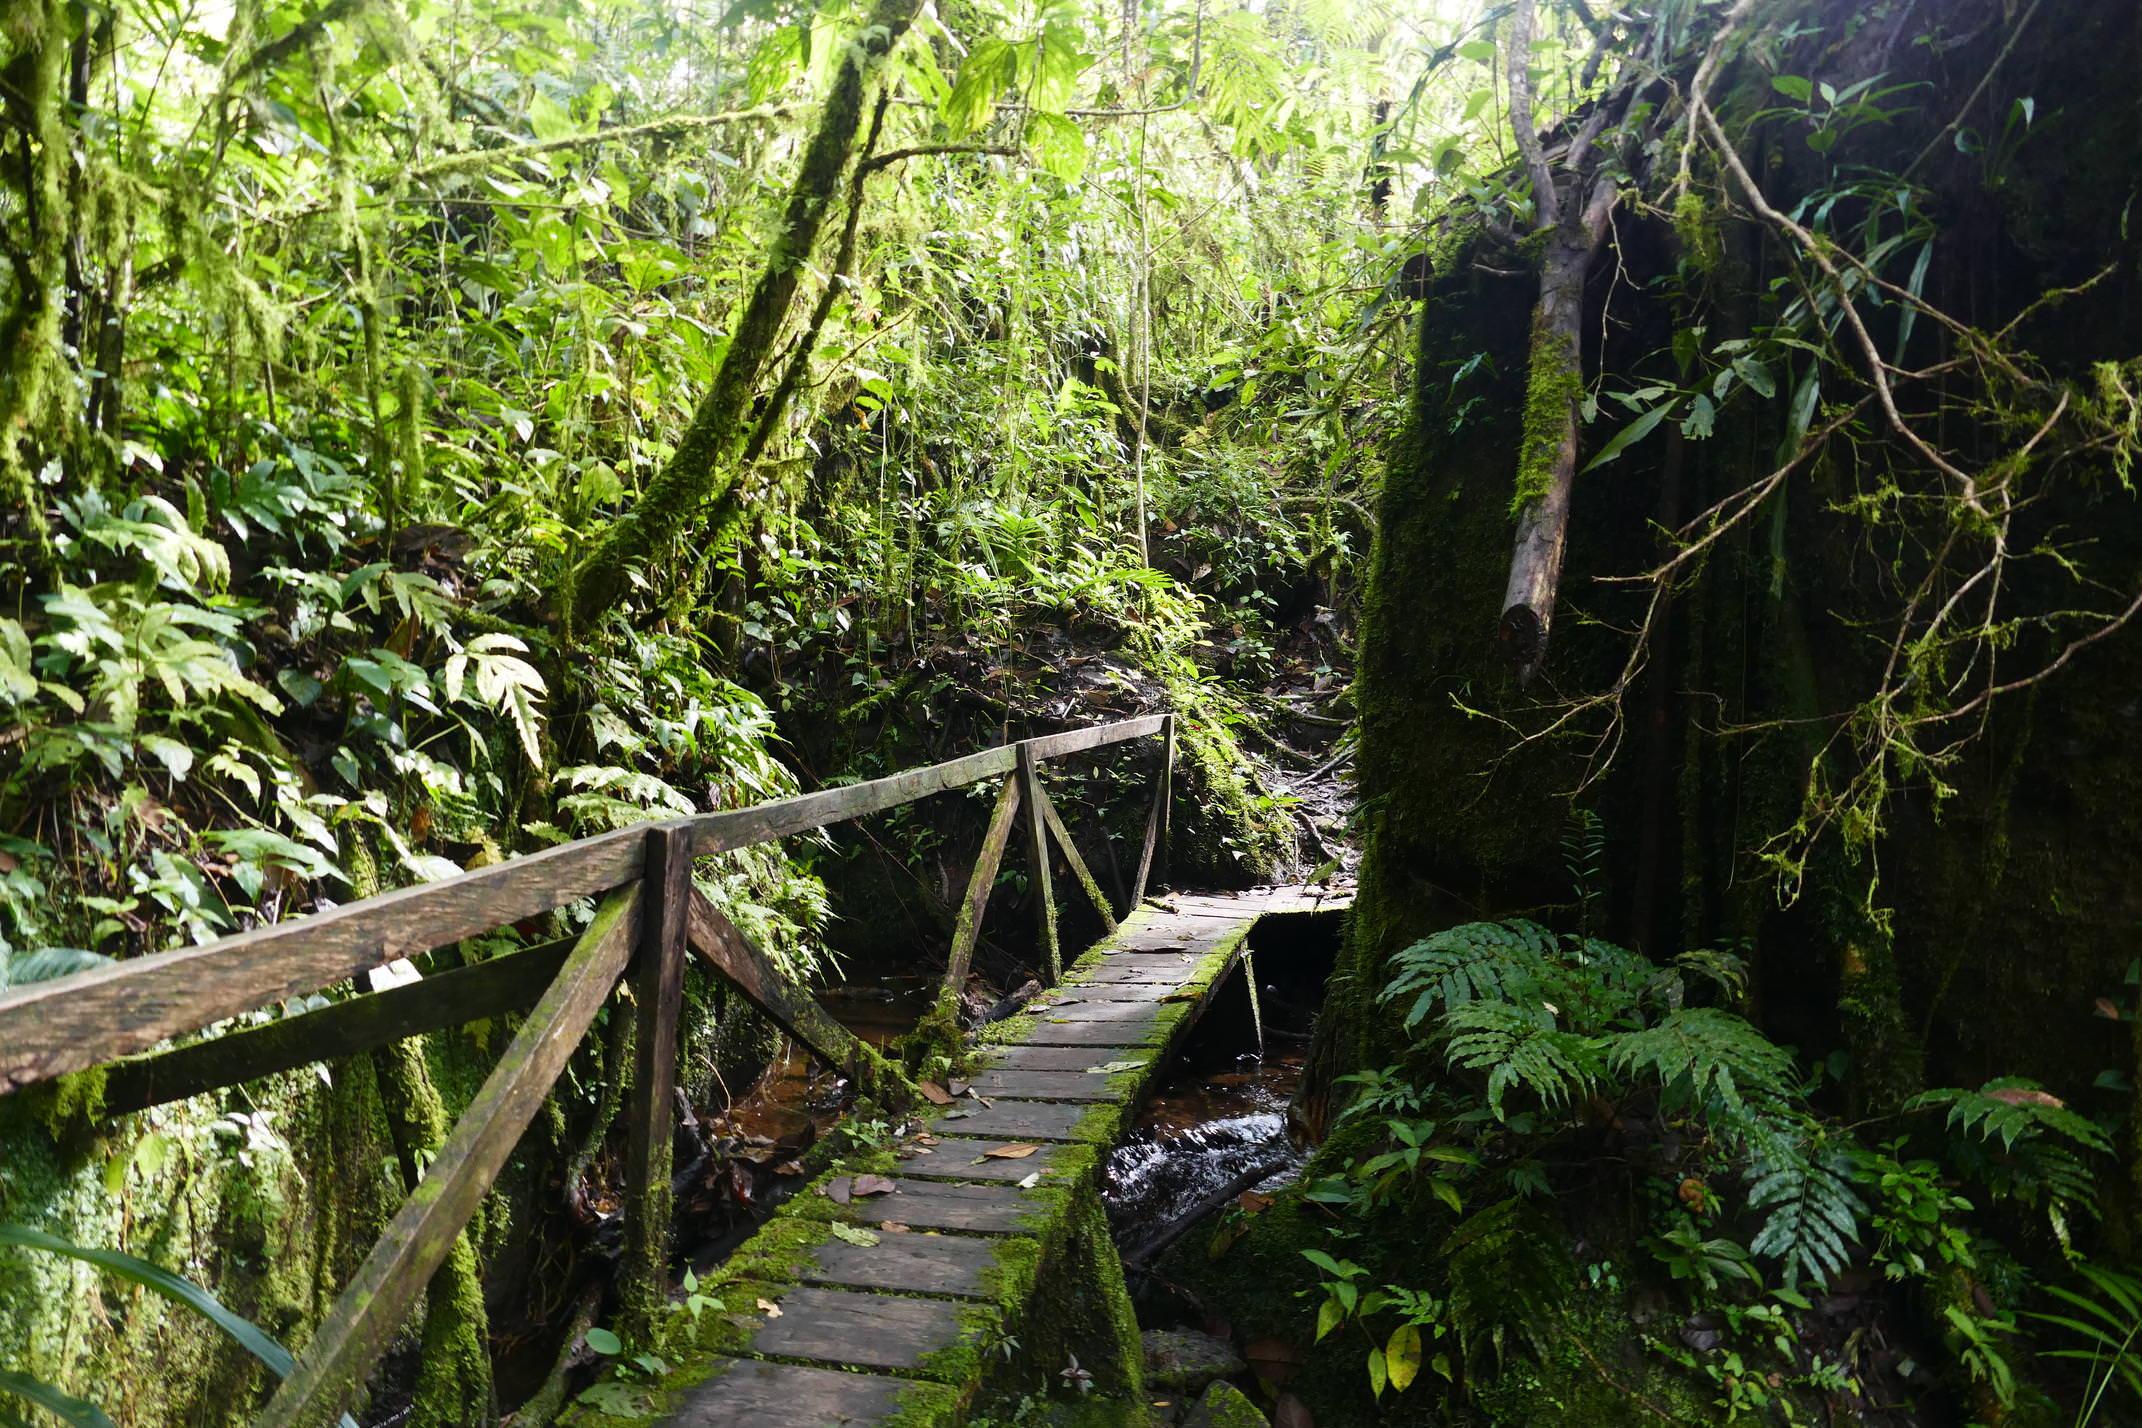 Nicaragua jinotega penas blancas path to cascada arcoiris copyright pura emma bye